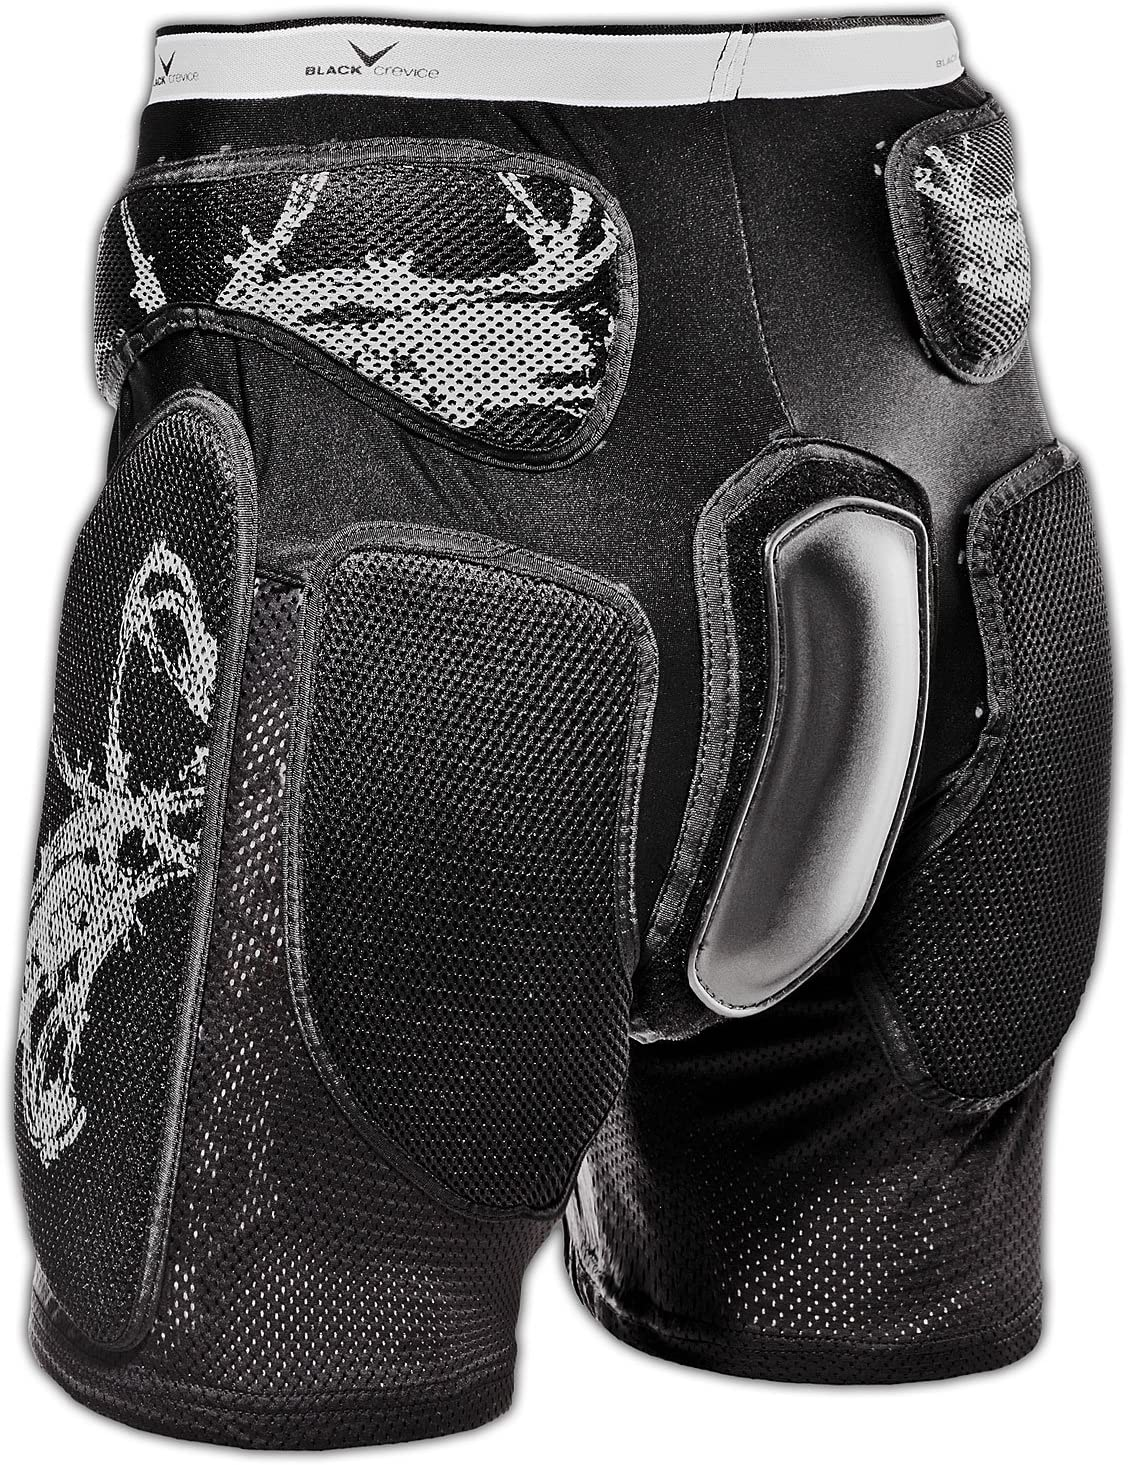 Black Crevice Crevice Pantaloncini Protettivi Unisex Adulto